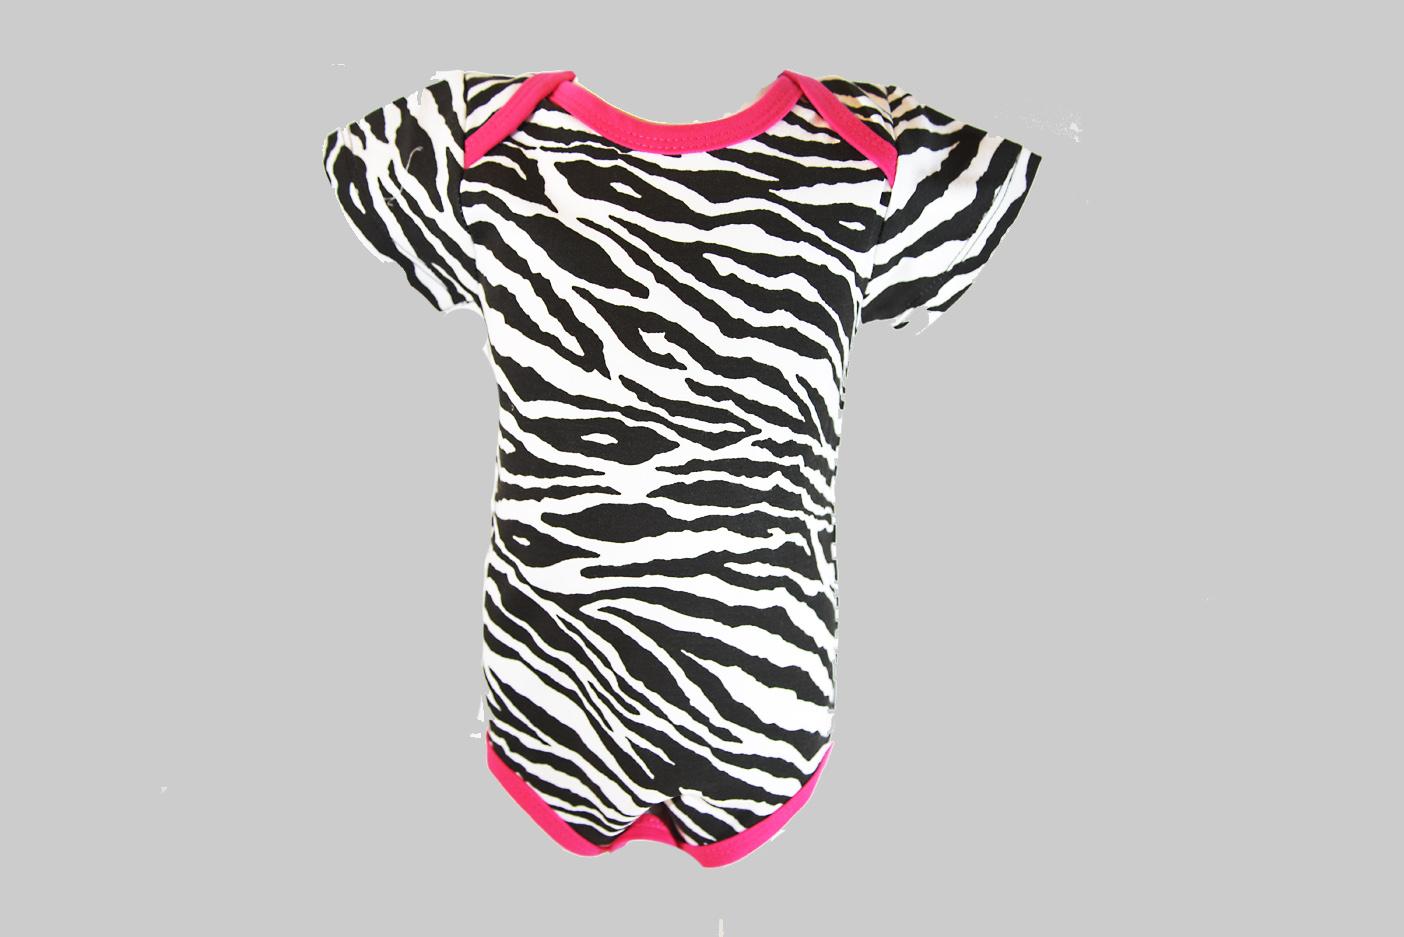 Zebra Pink Trim Baby Jumpsuit